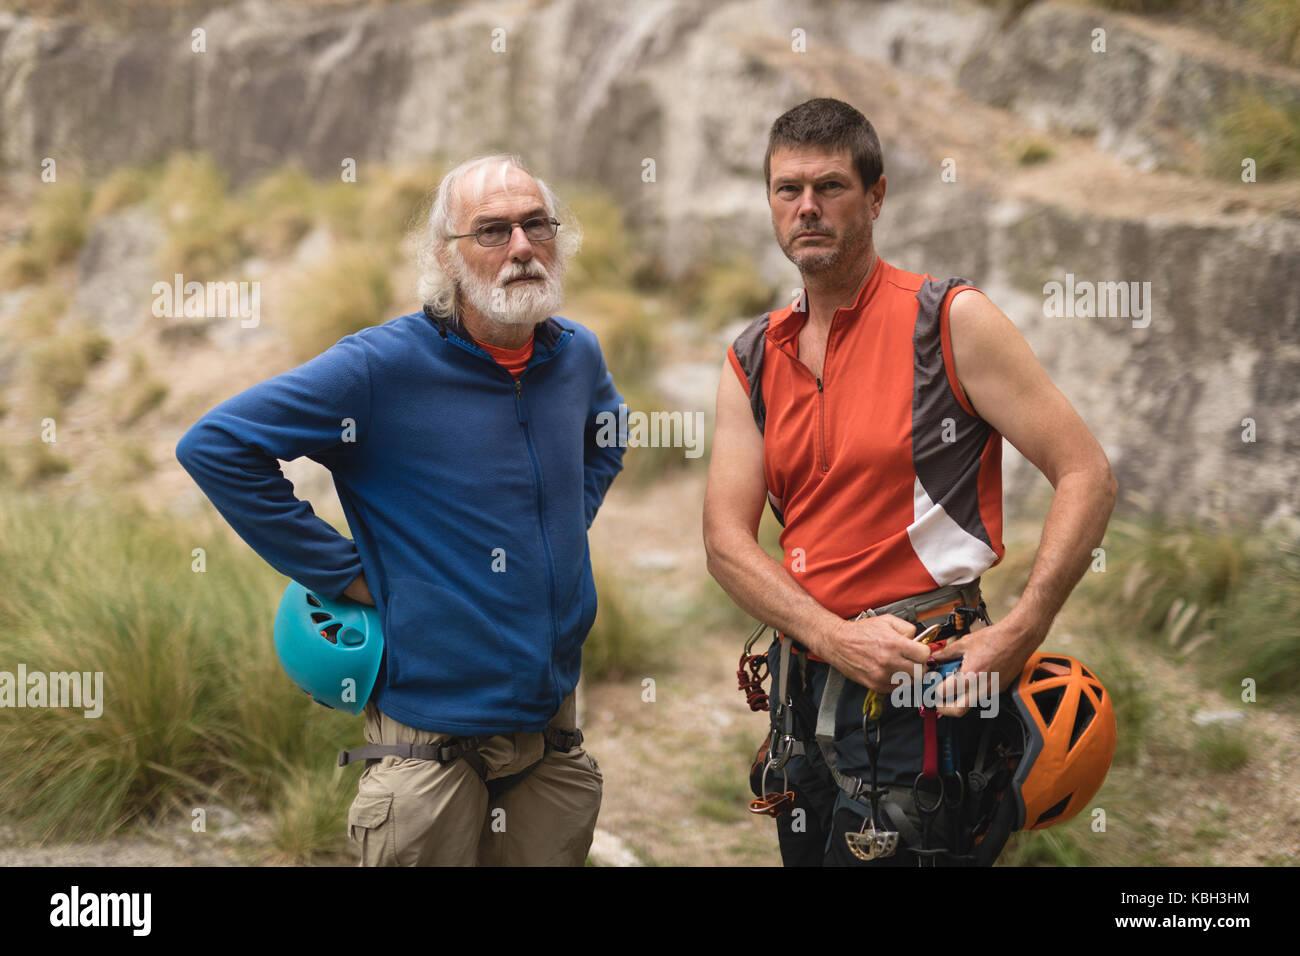 Retrato de confianza amigos preparando para montañismo Imagen De Stock